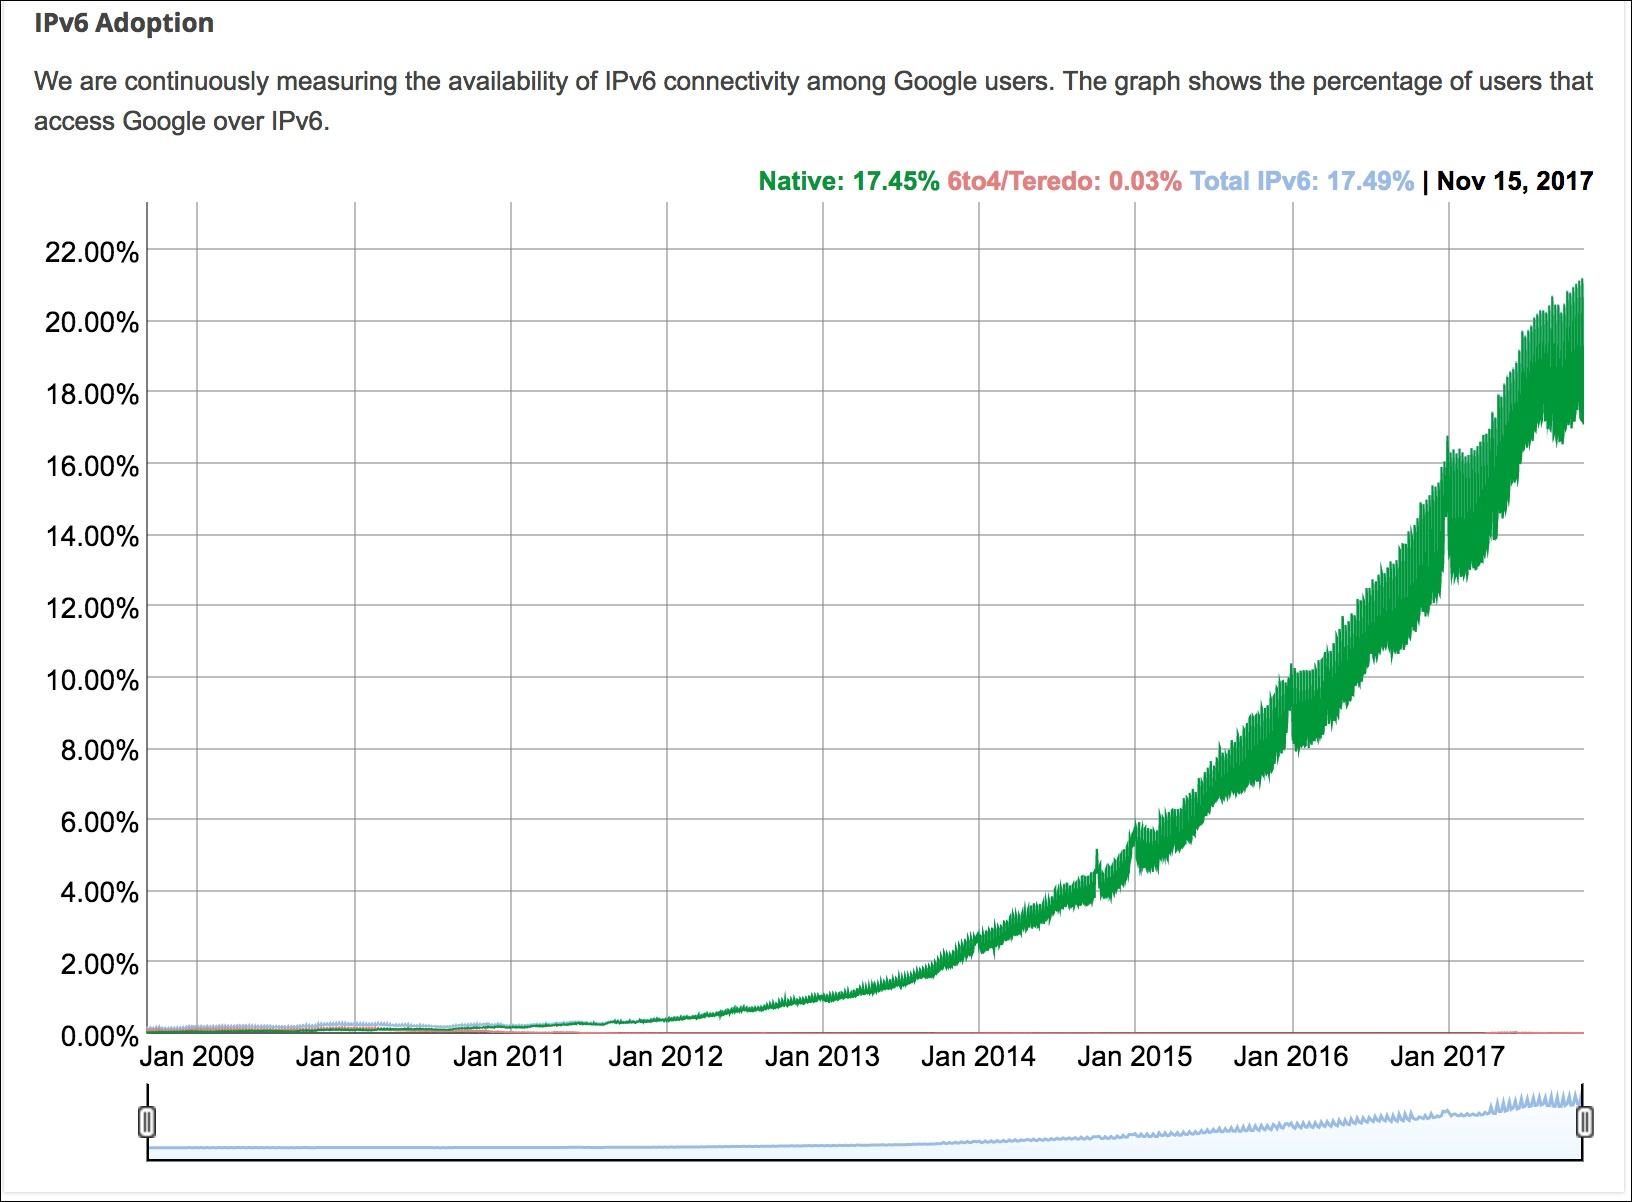 google-ipv6-data.jpg